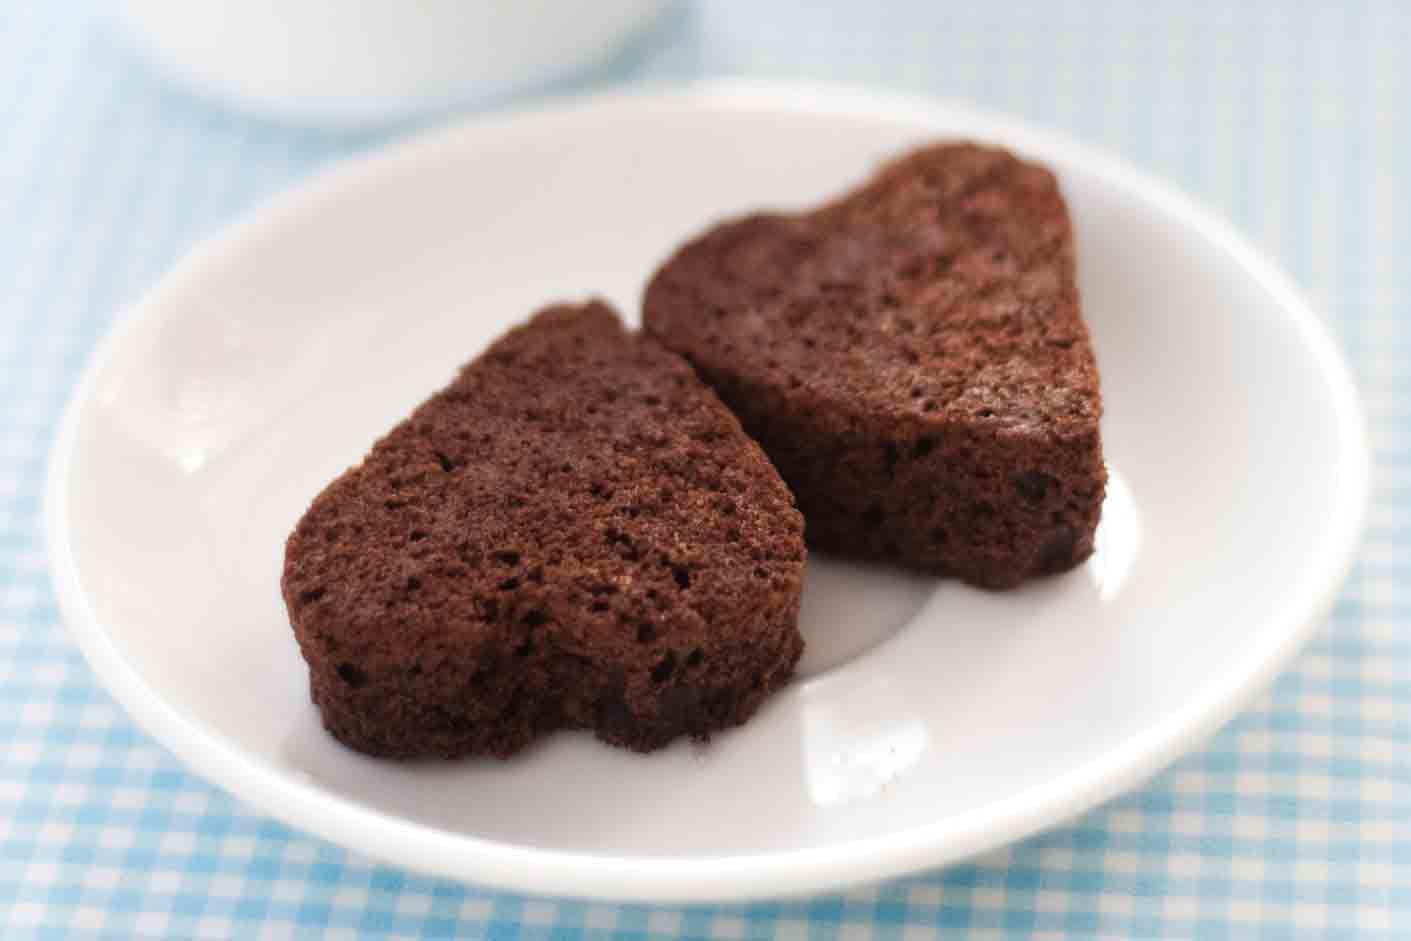 Heart shaped brownies